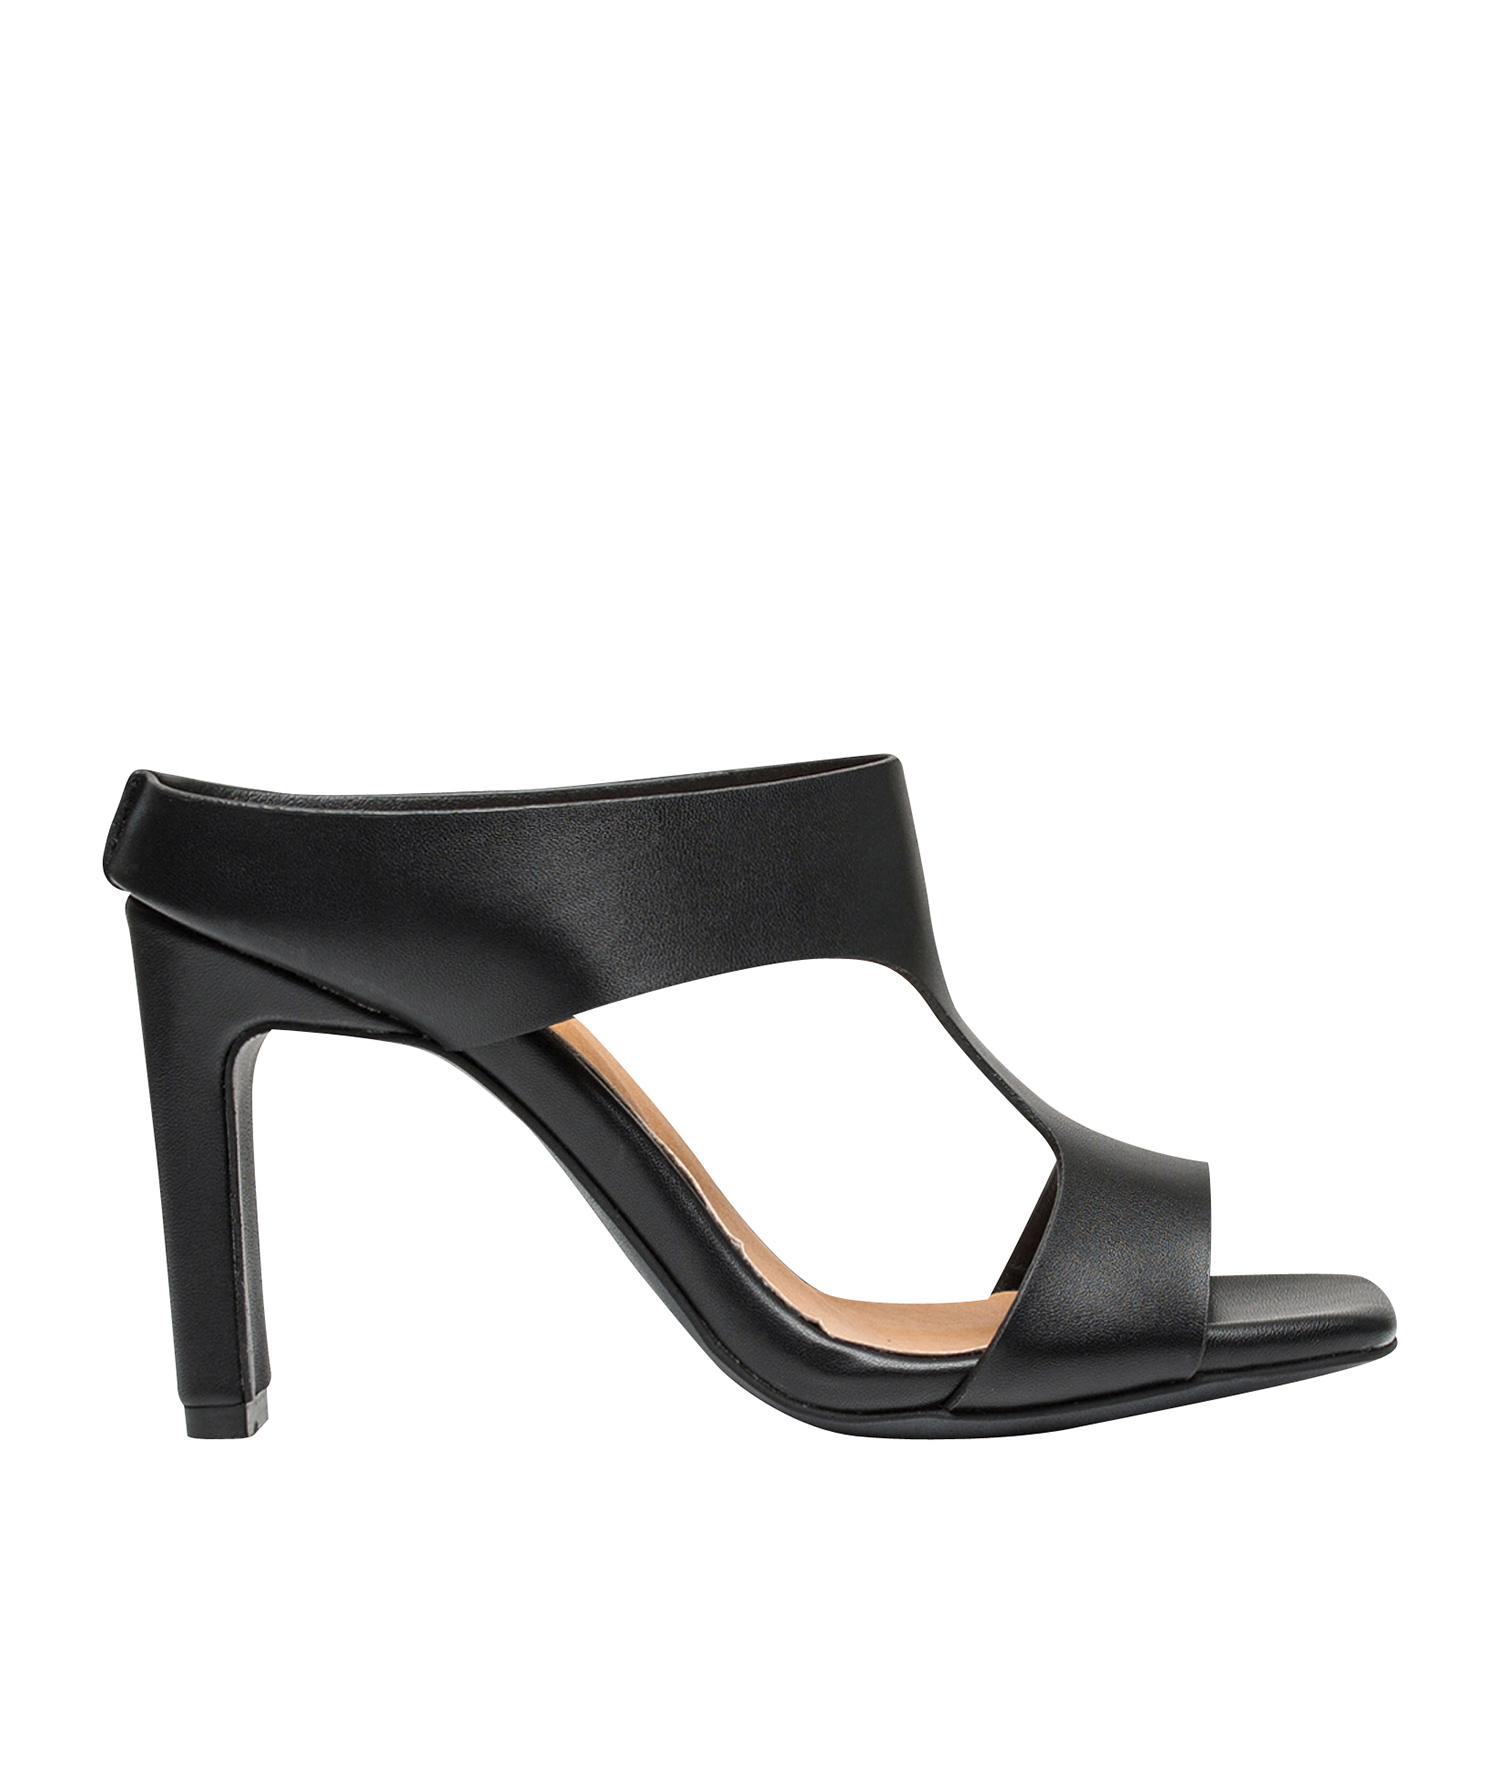 a9131d85f64383 AnnaKastle Womens Cut-Out Slide Heel Mule Dress Sandal Black